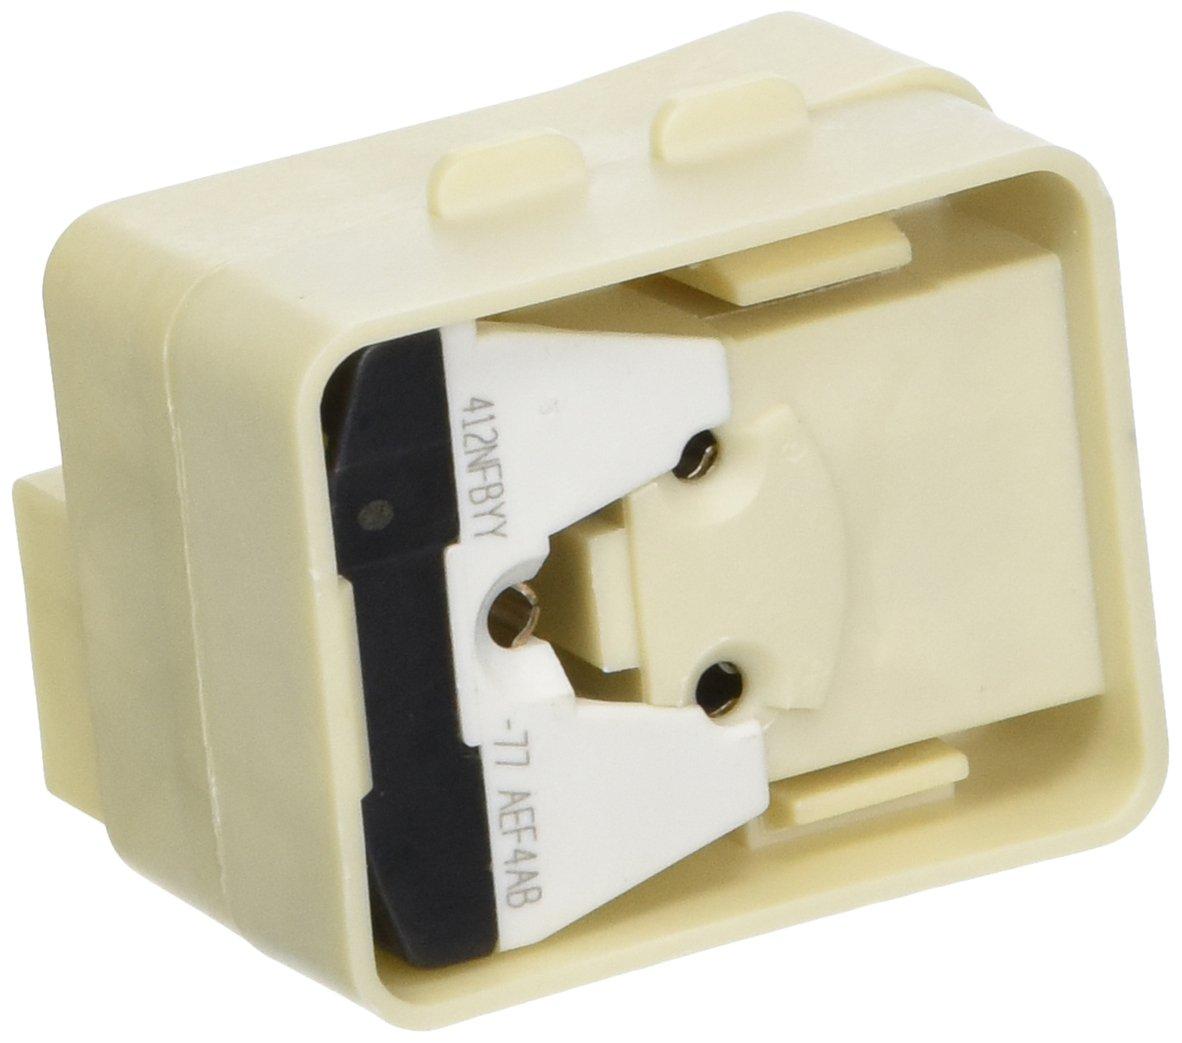 Amazon.com: Frigidaire 241707701 Start Device Refrigerator: Home Improvement